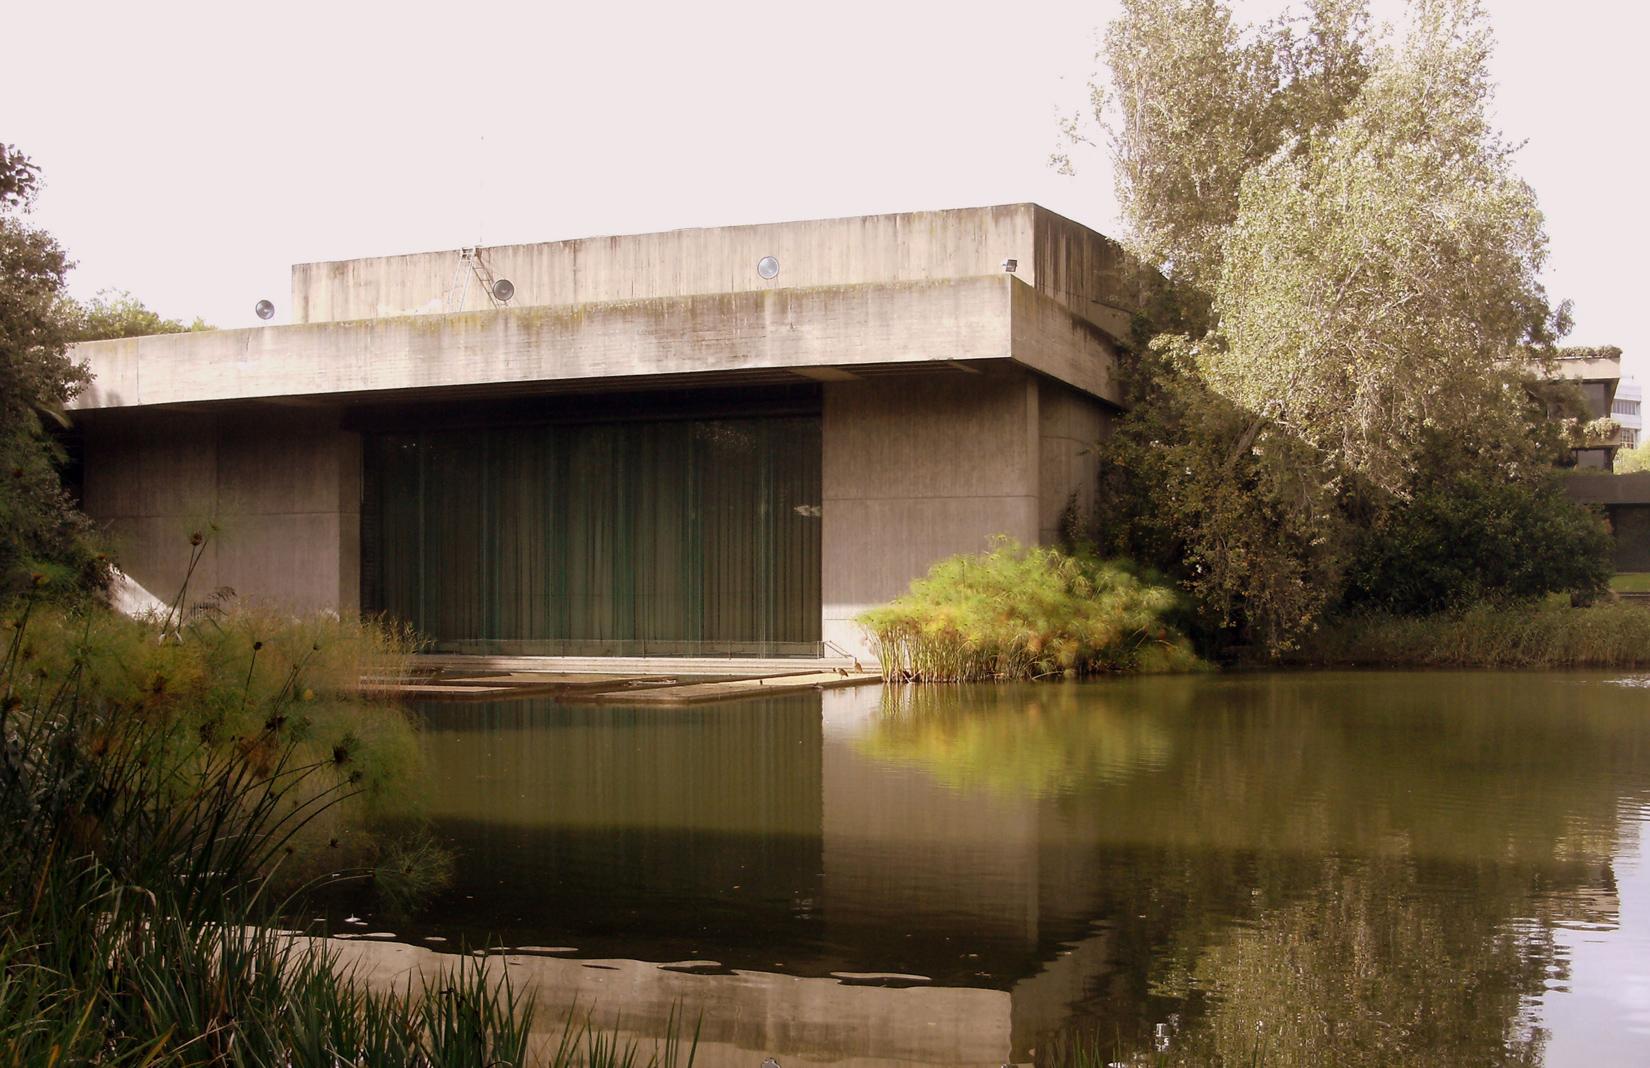 Caolouste Gulbenkian Foundation Lisbon